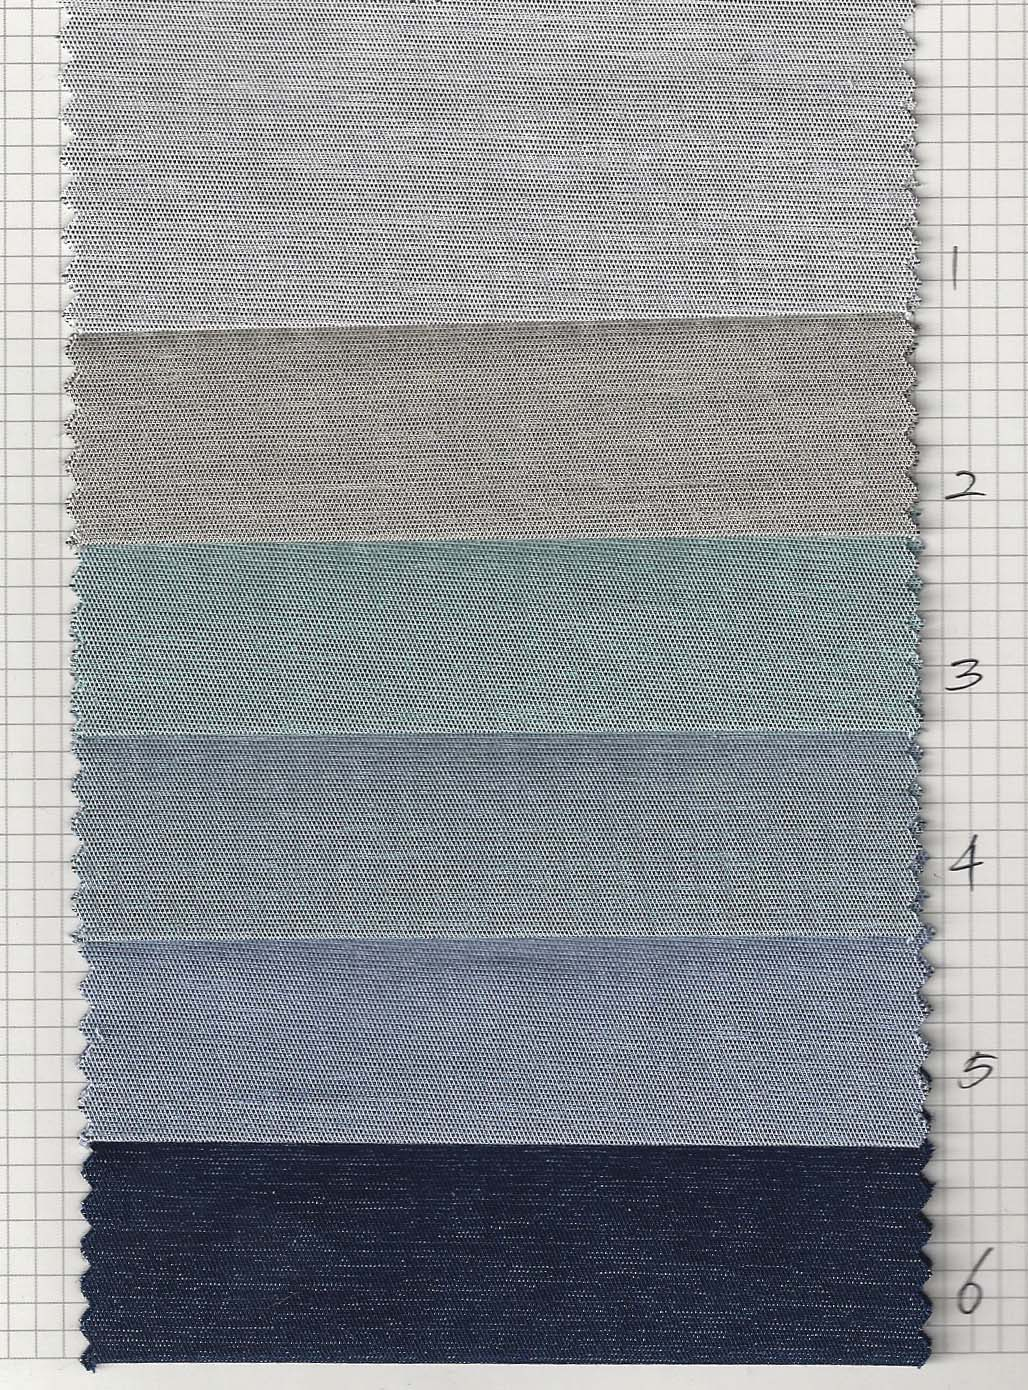 Tai Sheng Textile TS525.jpg